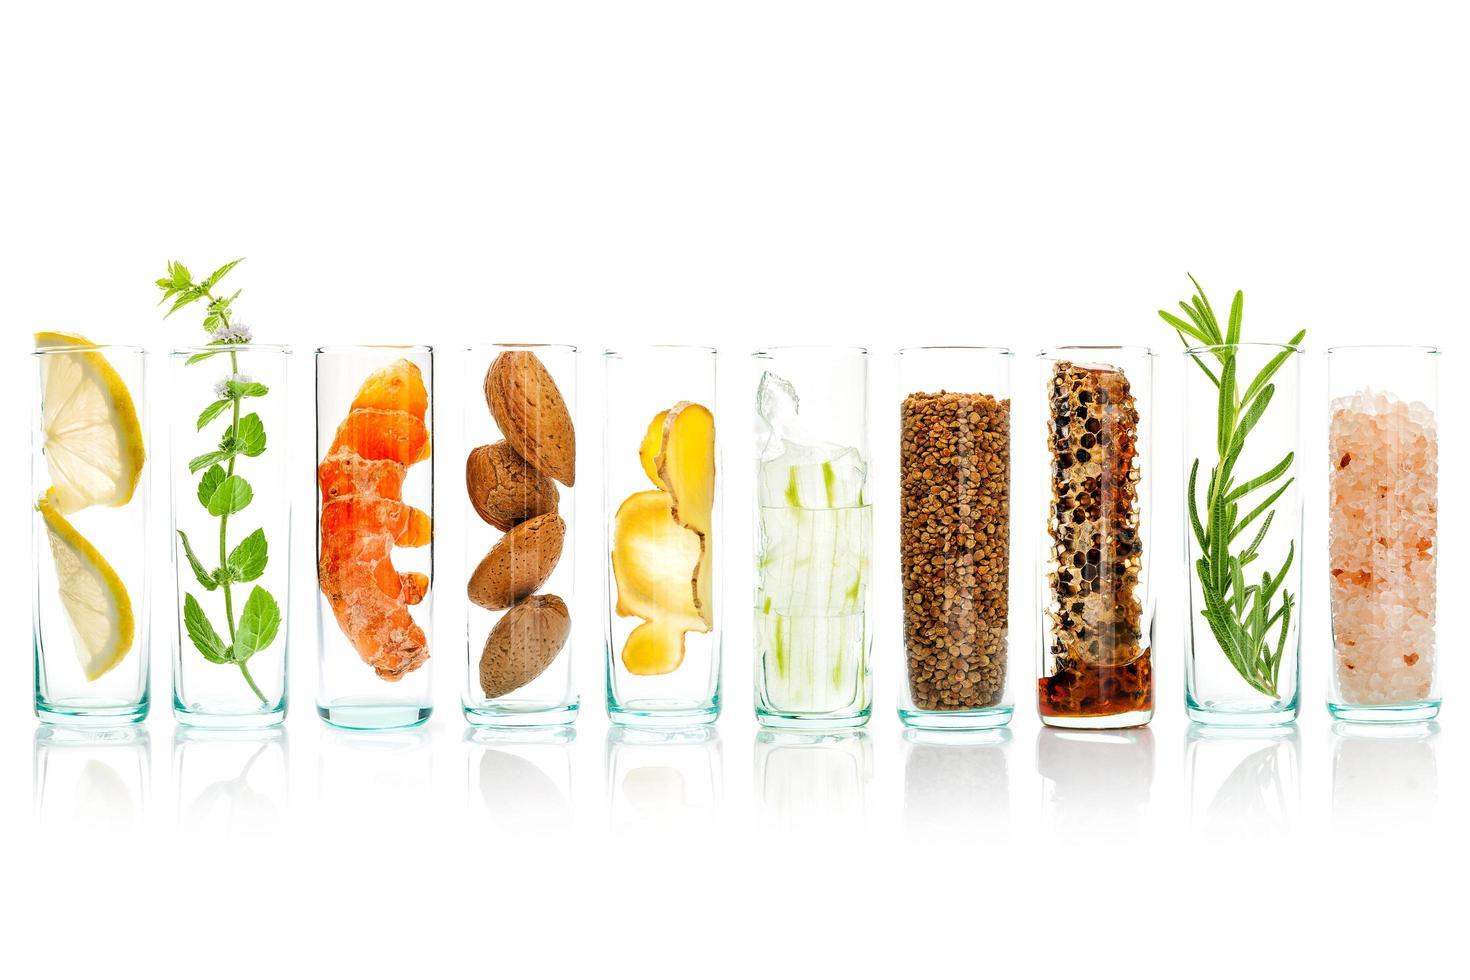 naturliga ingredienser i glasburkar foto